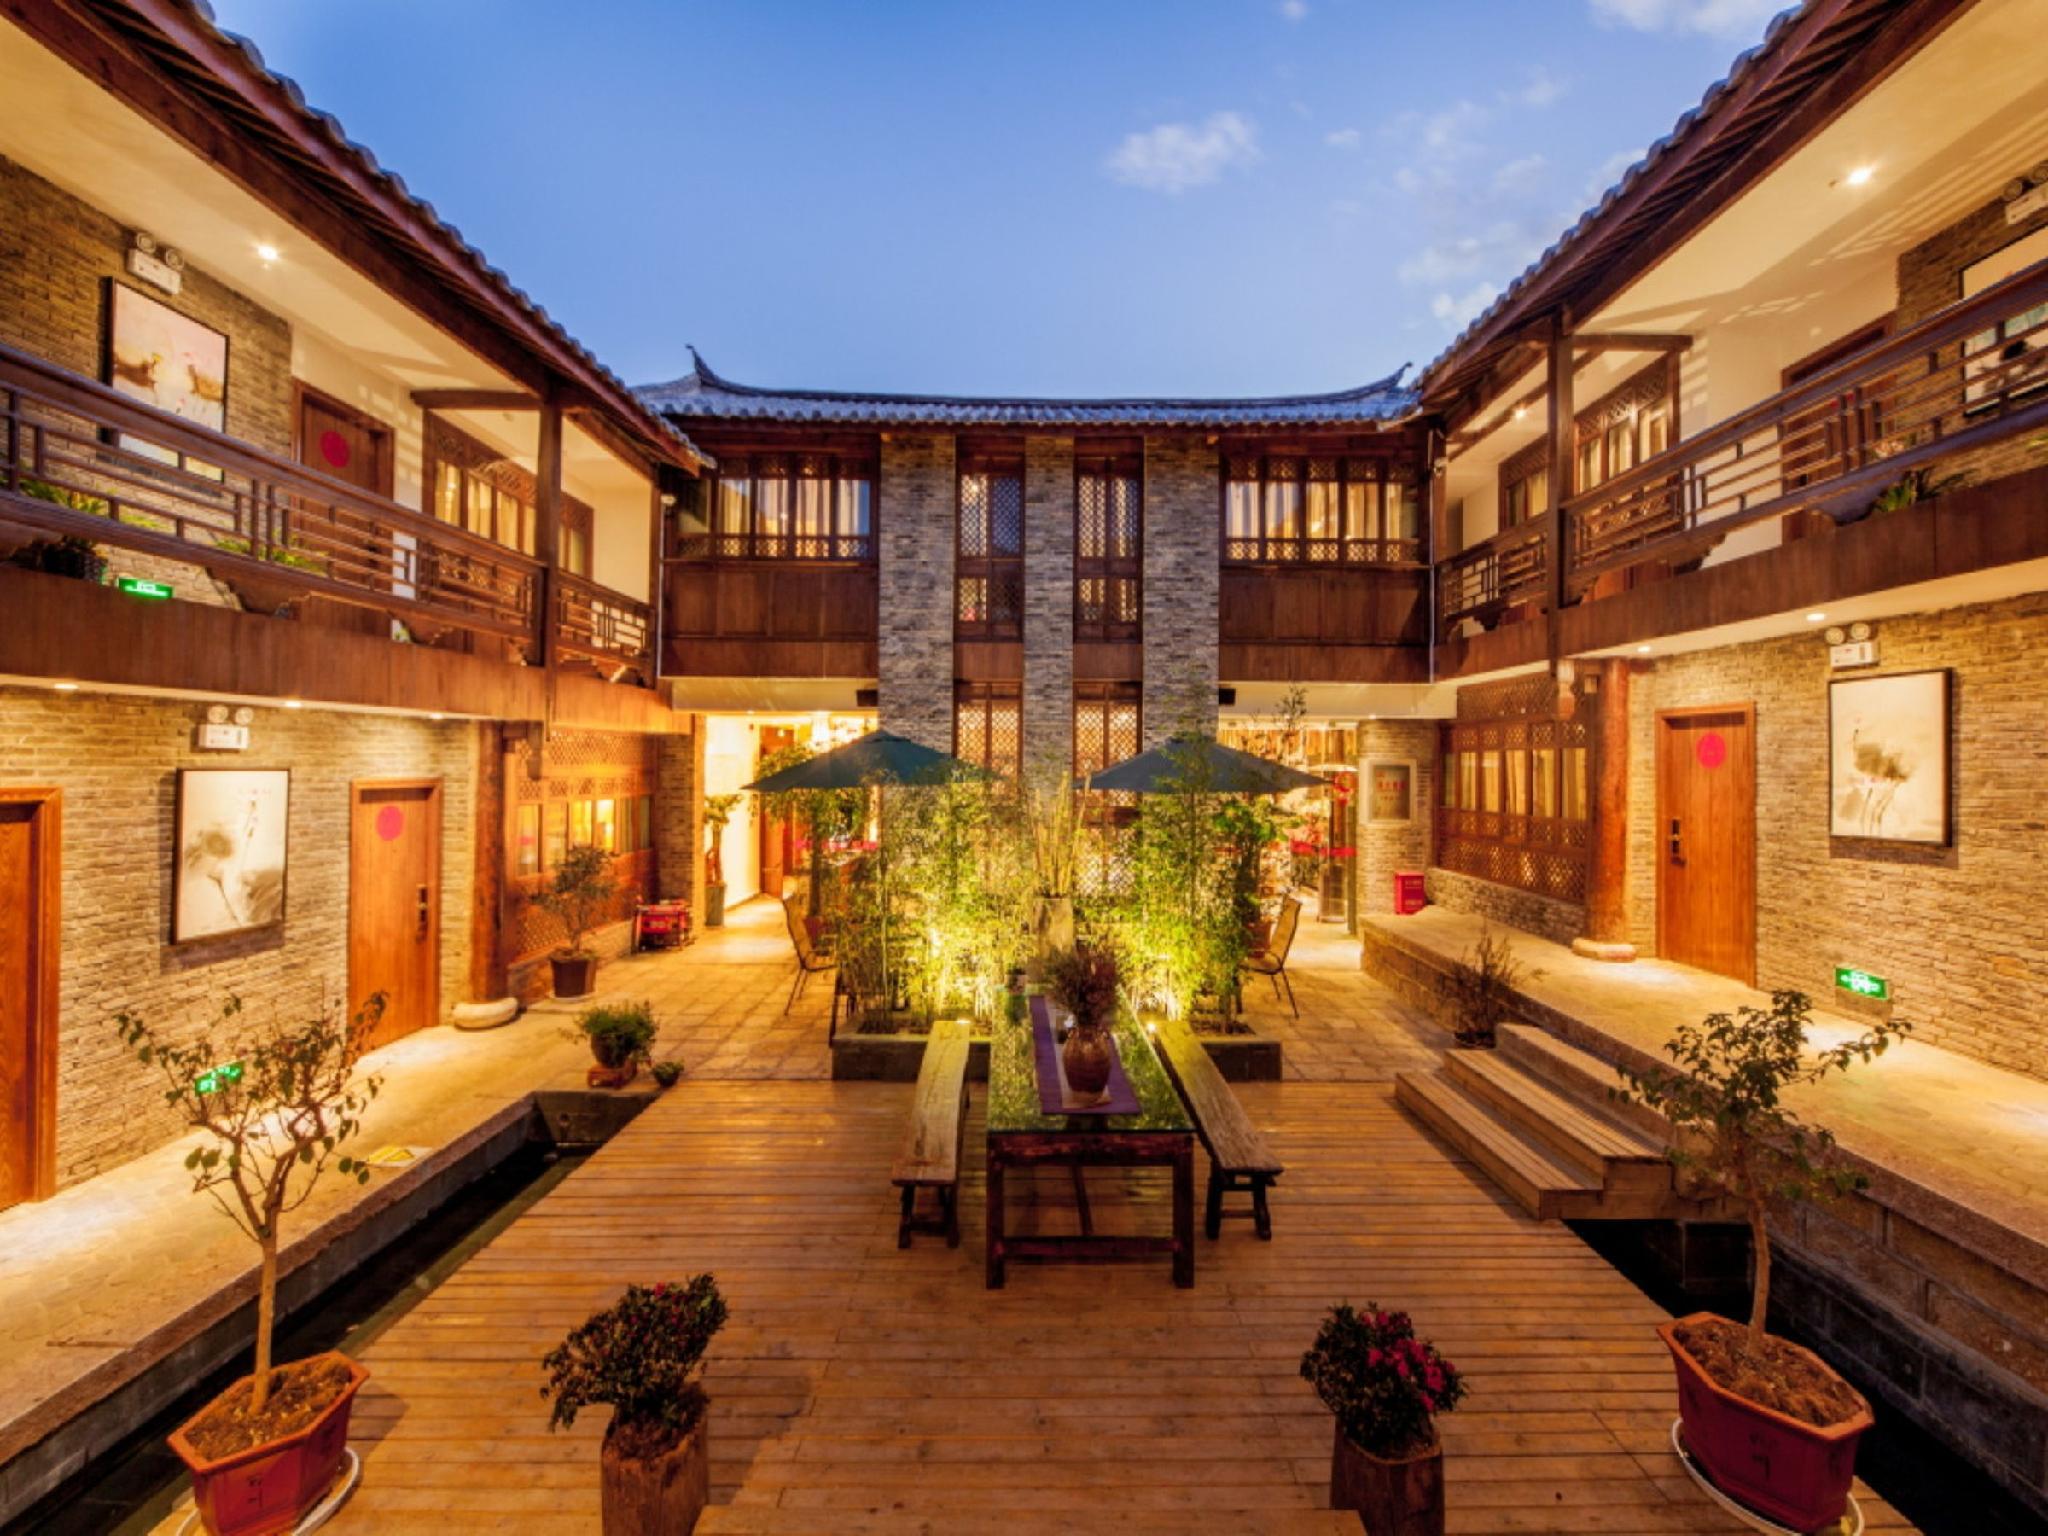 lijiang liman wenzhi hotel china from 47 save on agoda rh agoda com